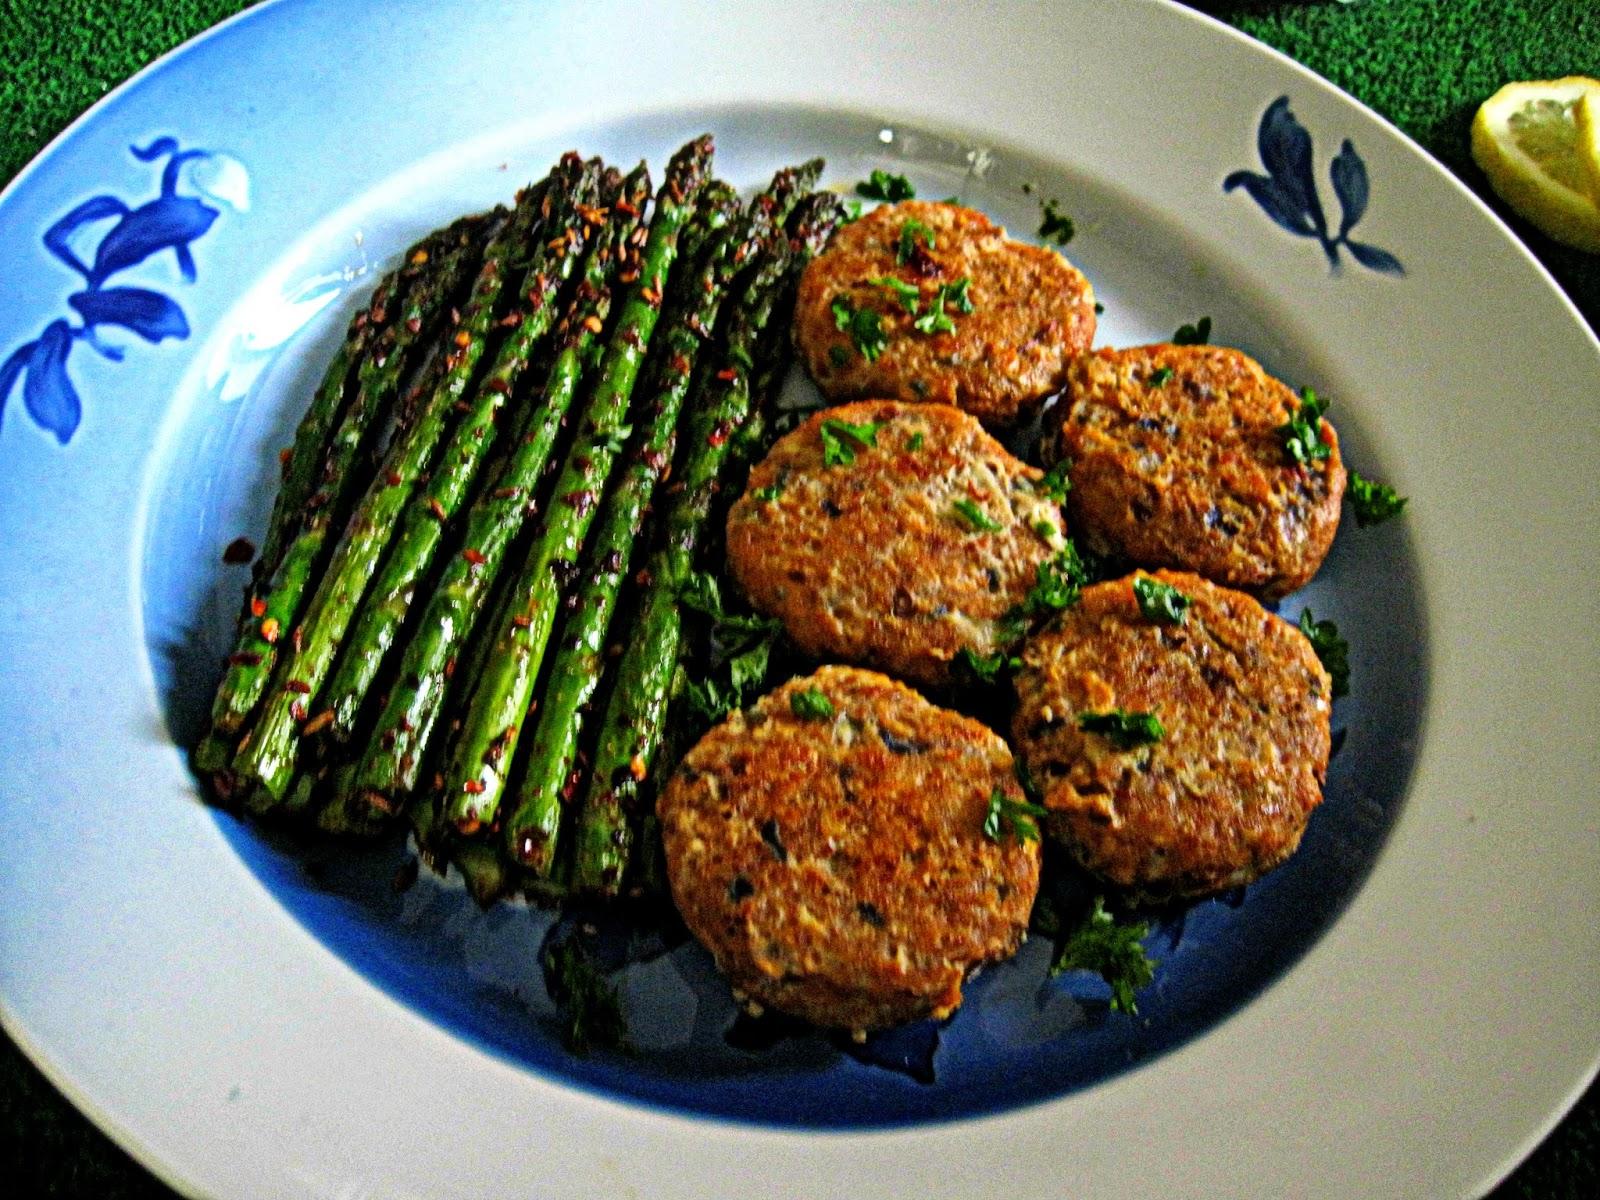 http://cupcakeluvs.blogspot.dk/2014/04/machli-kebab.html